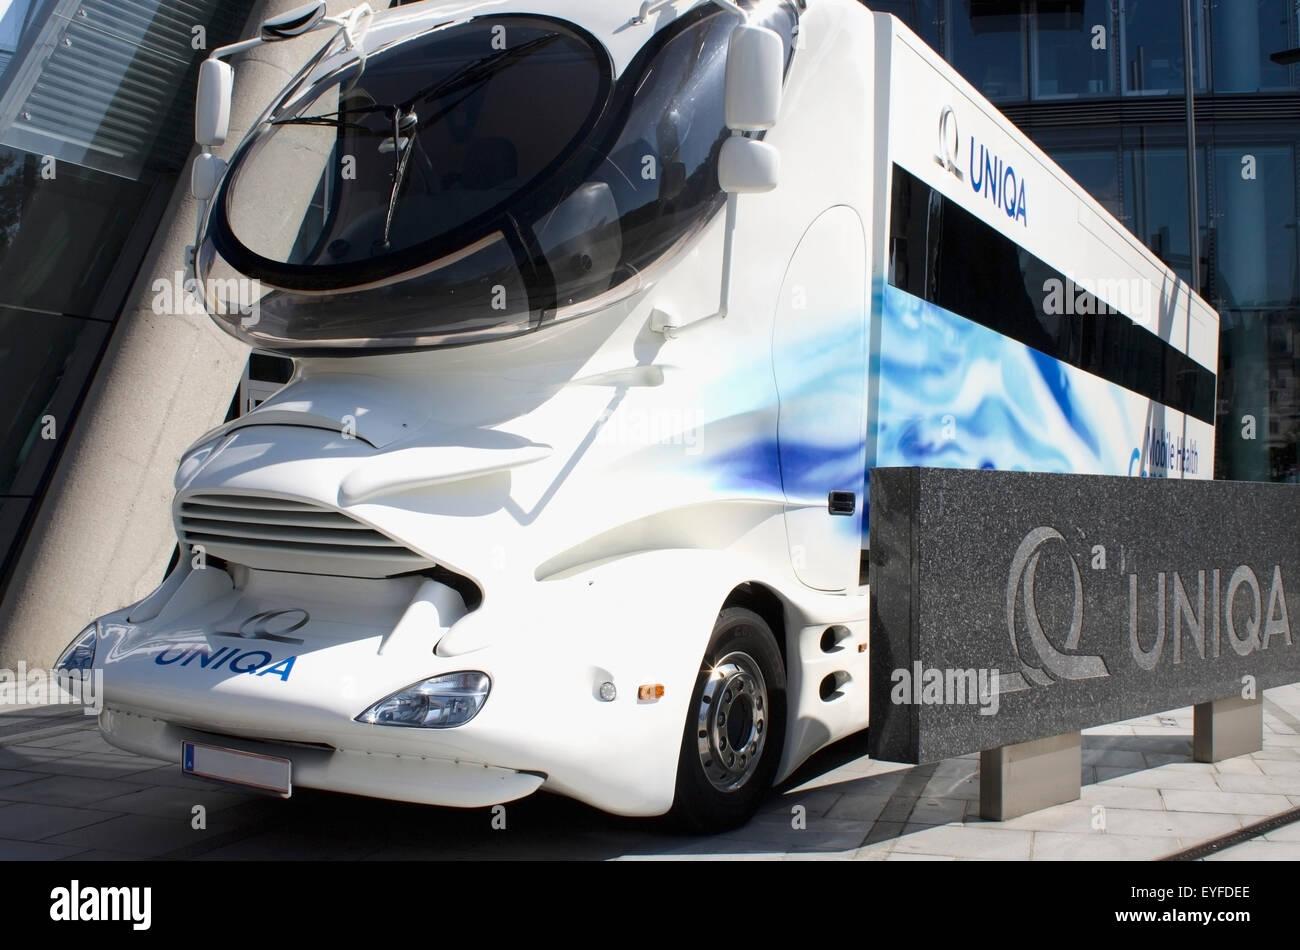 Austria, Mobile health bus